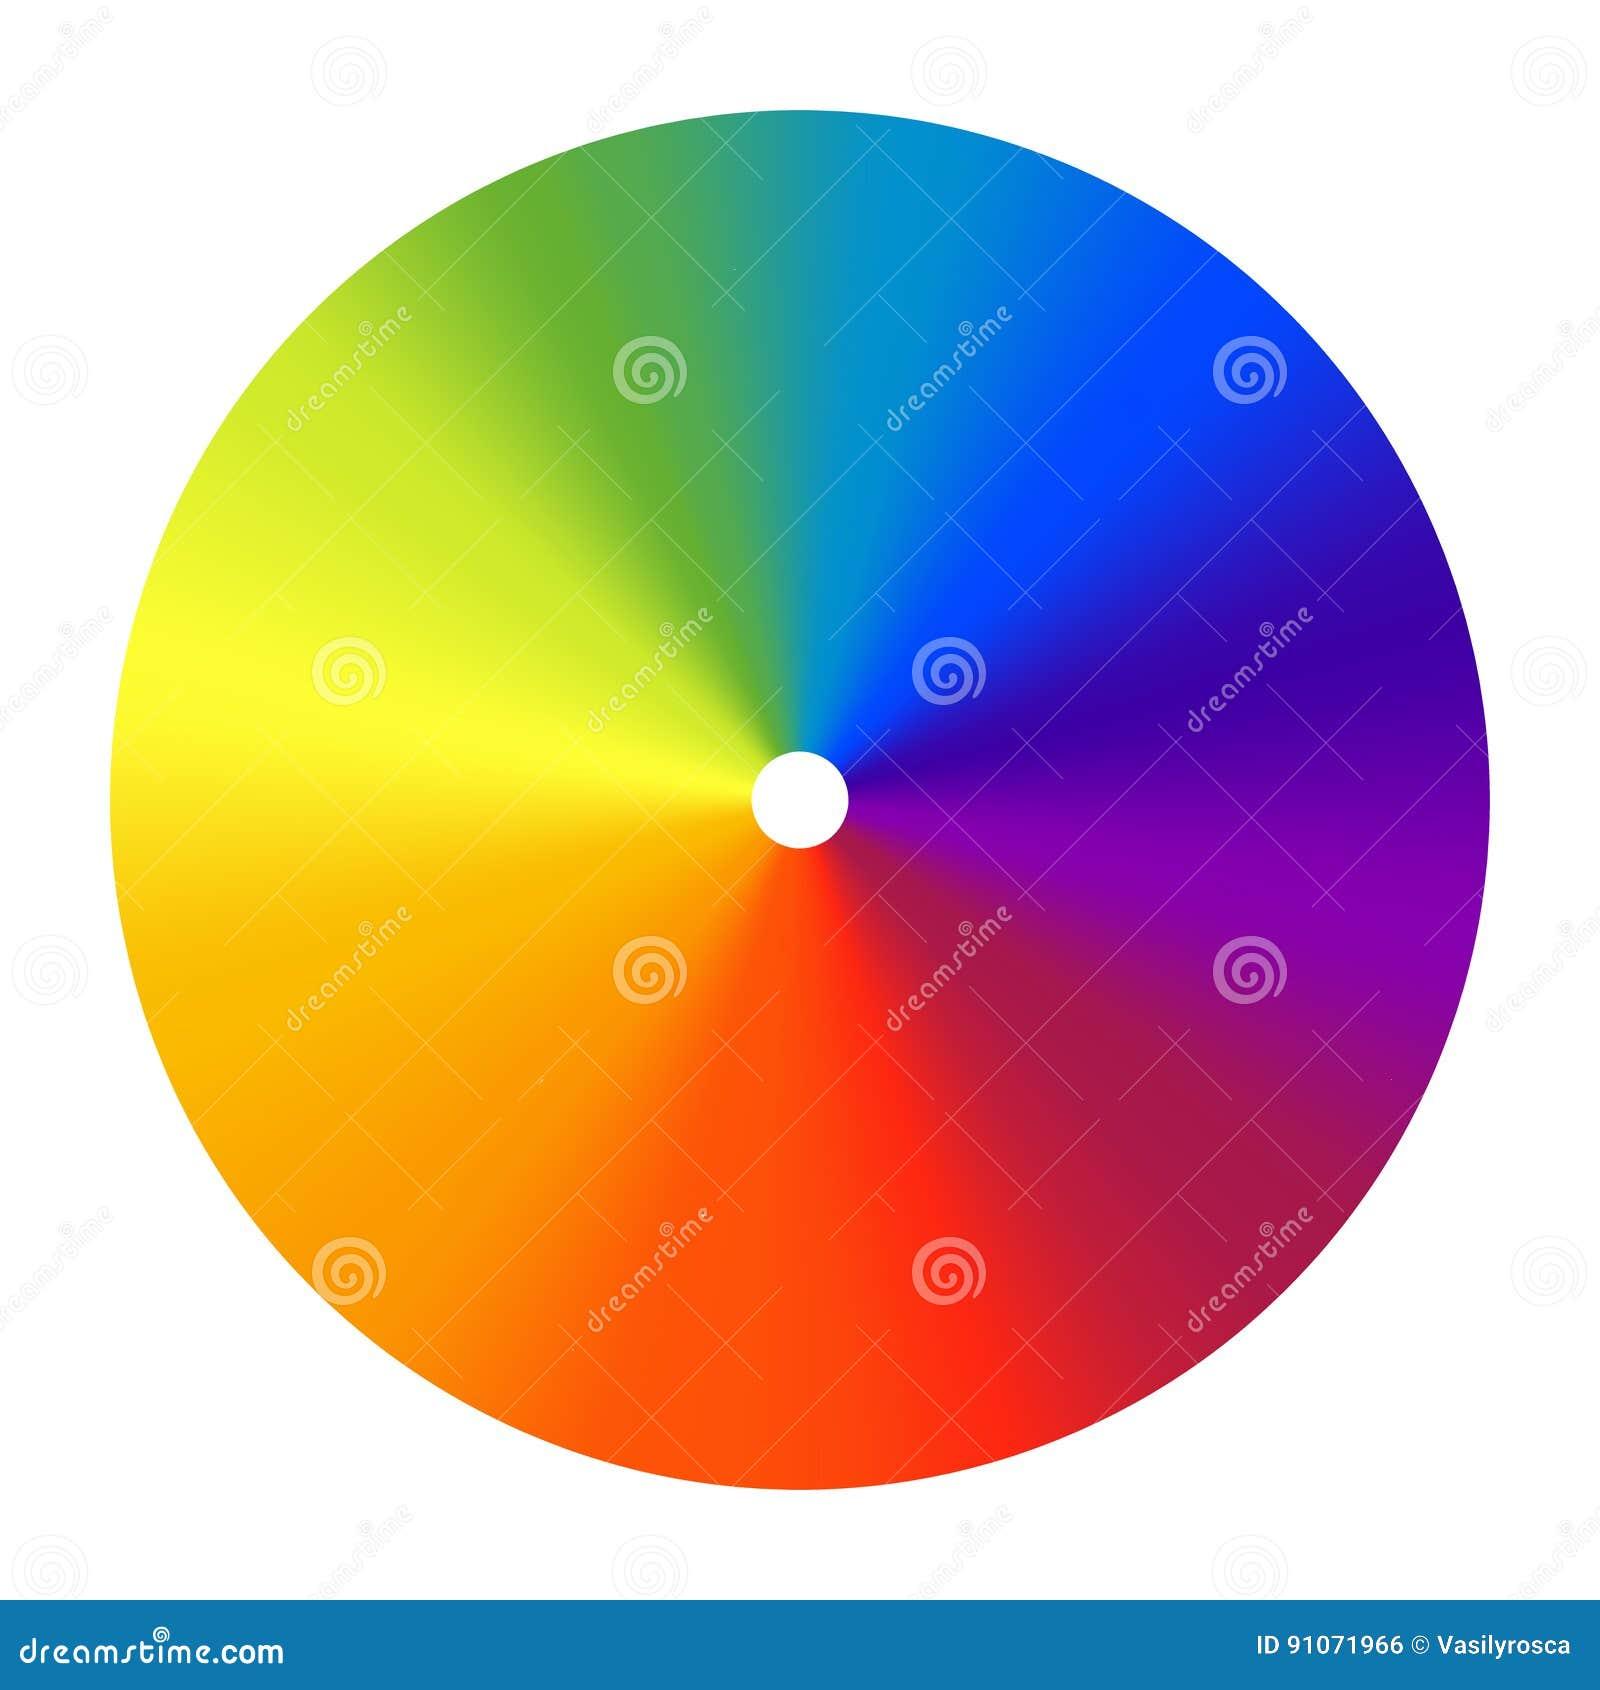 Color wheel vector spectrum. Colorful circle rainbow design. Creative saturation palette. Graphic illustration